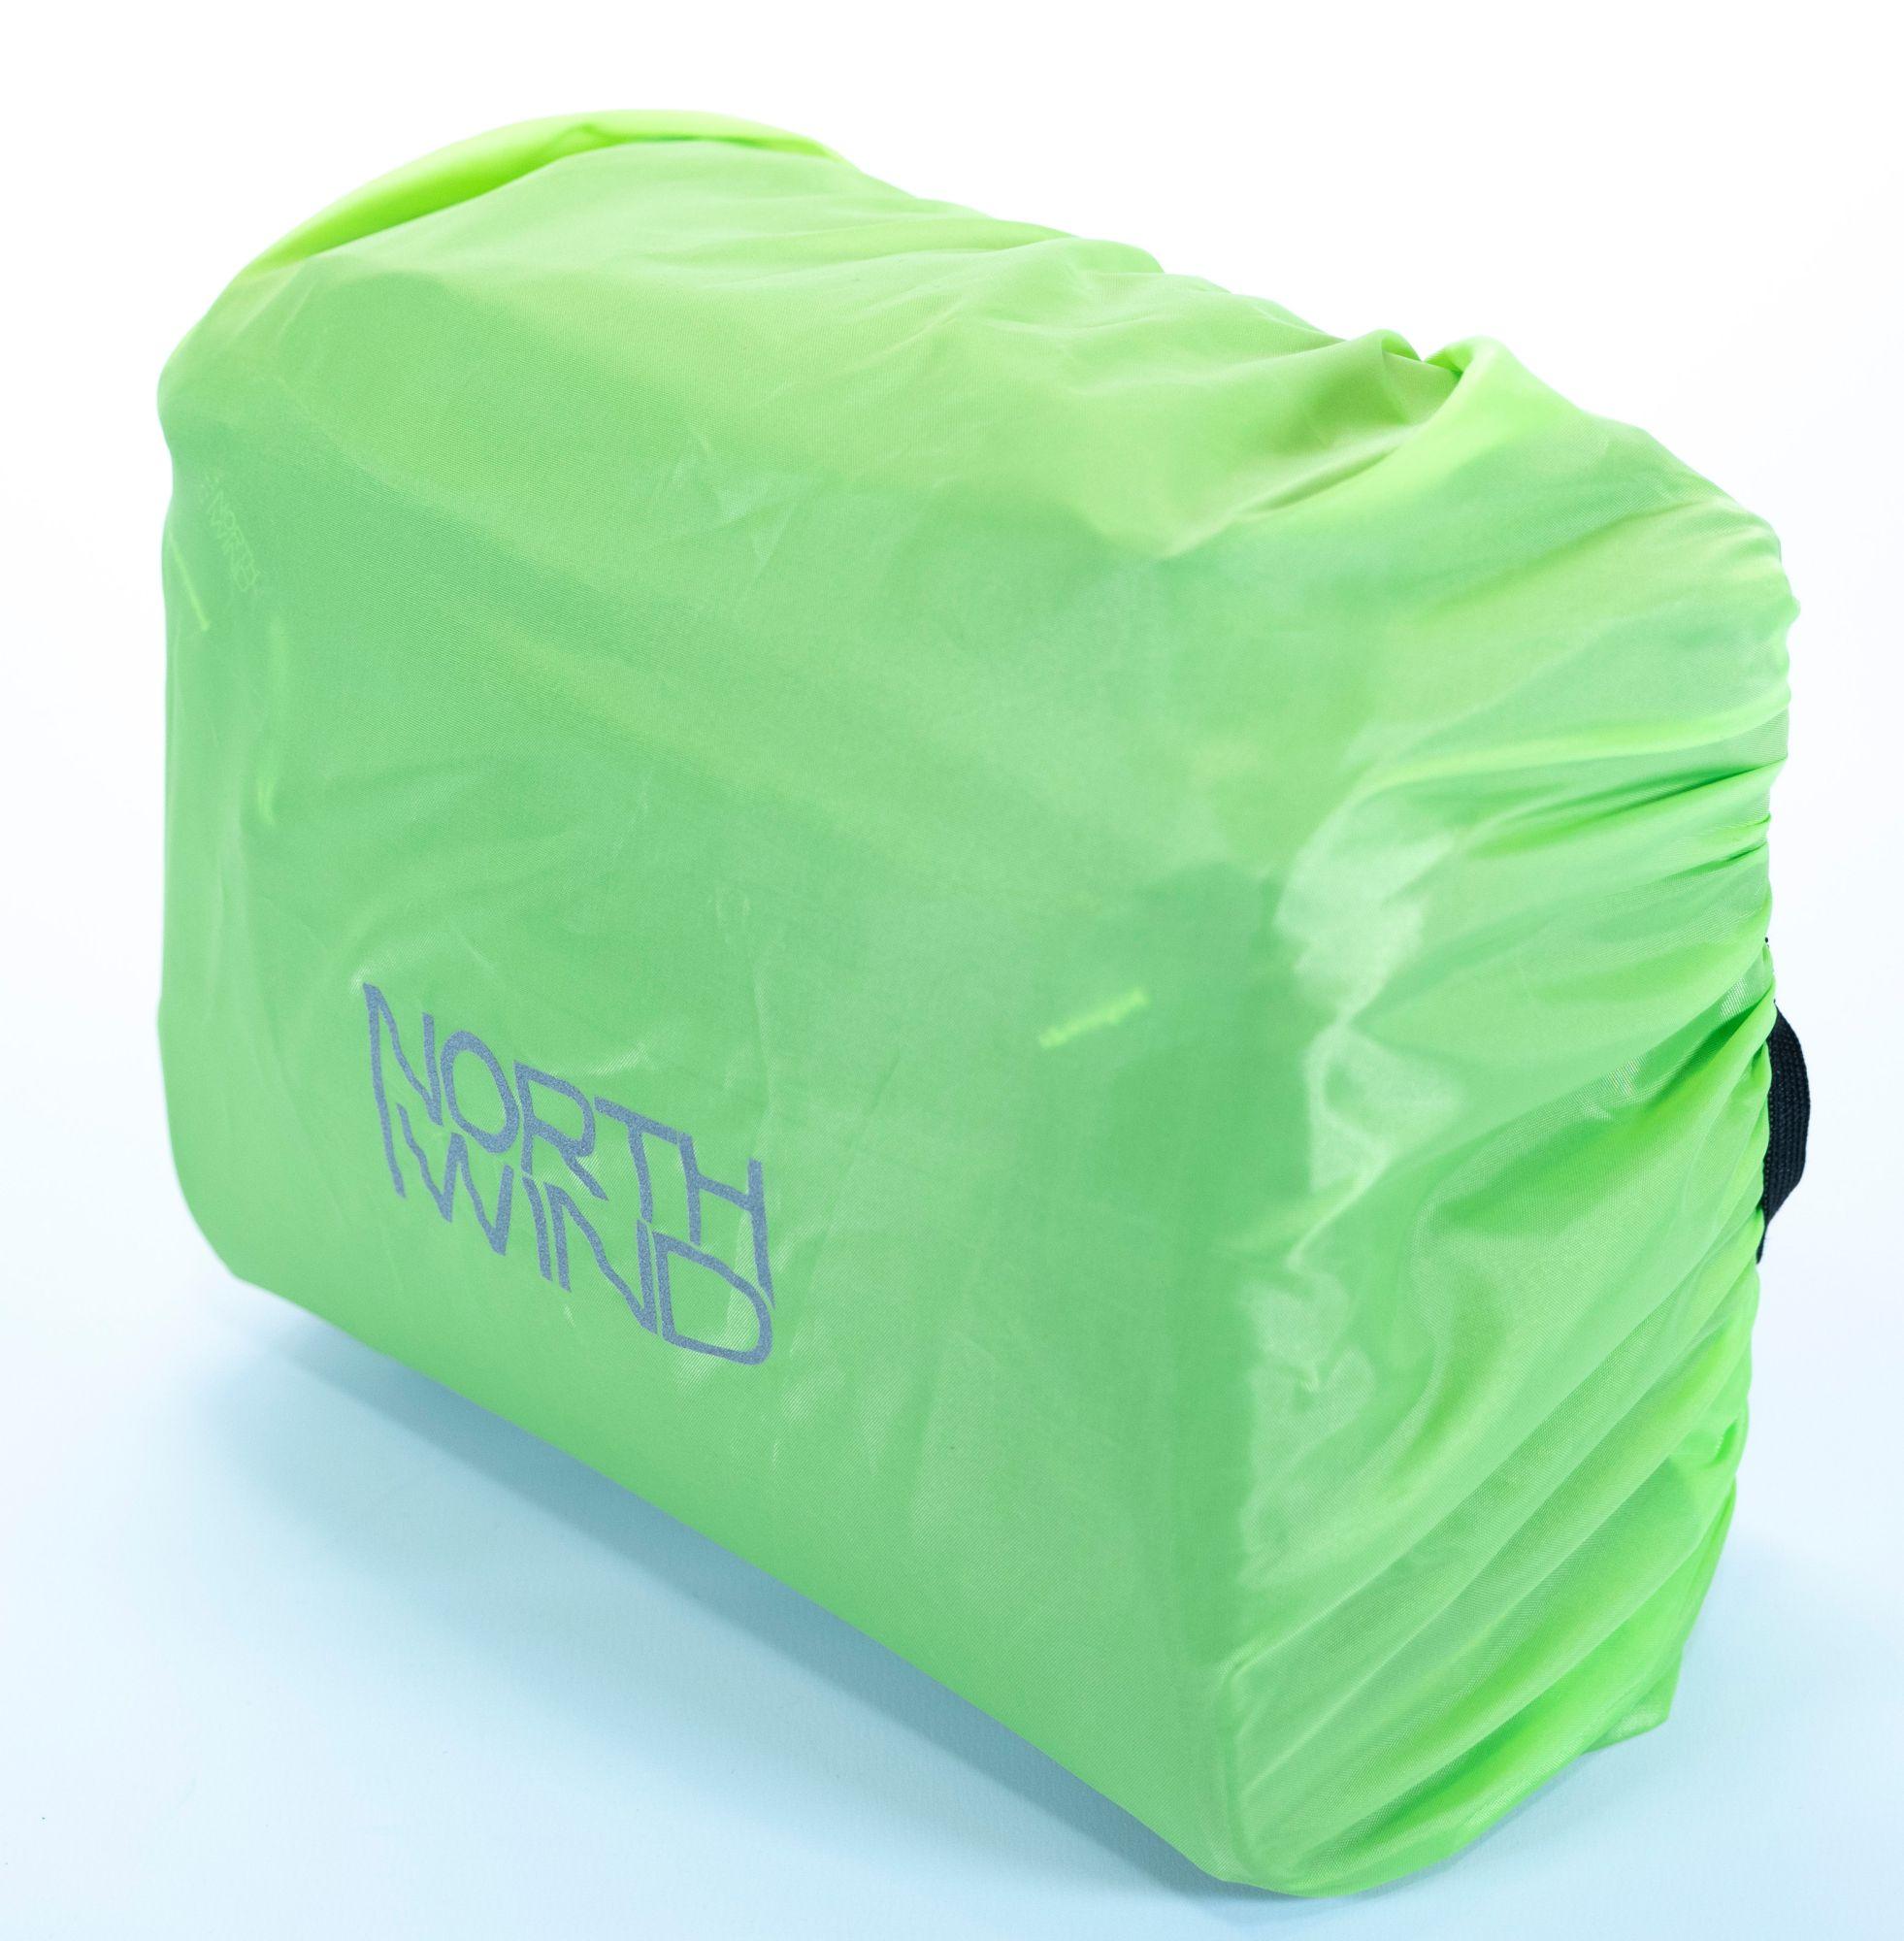 BULLS Northwind Lenkertasche Pure mit KF Adapt kh/li Washbag